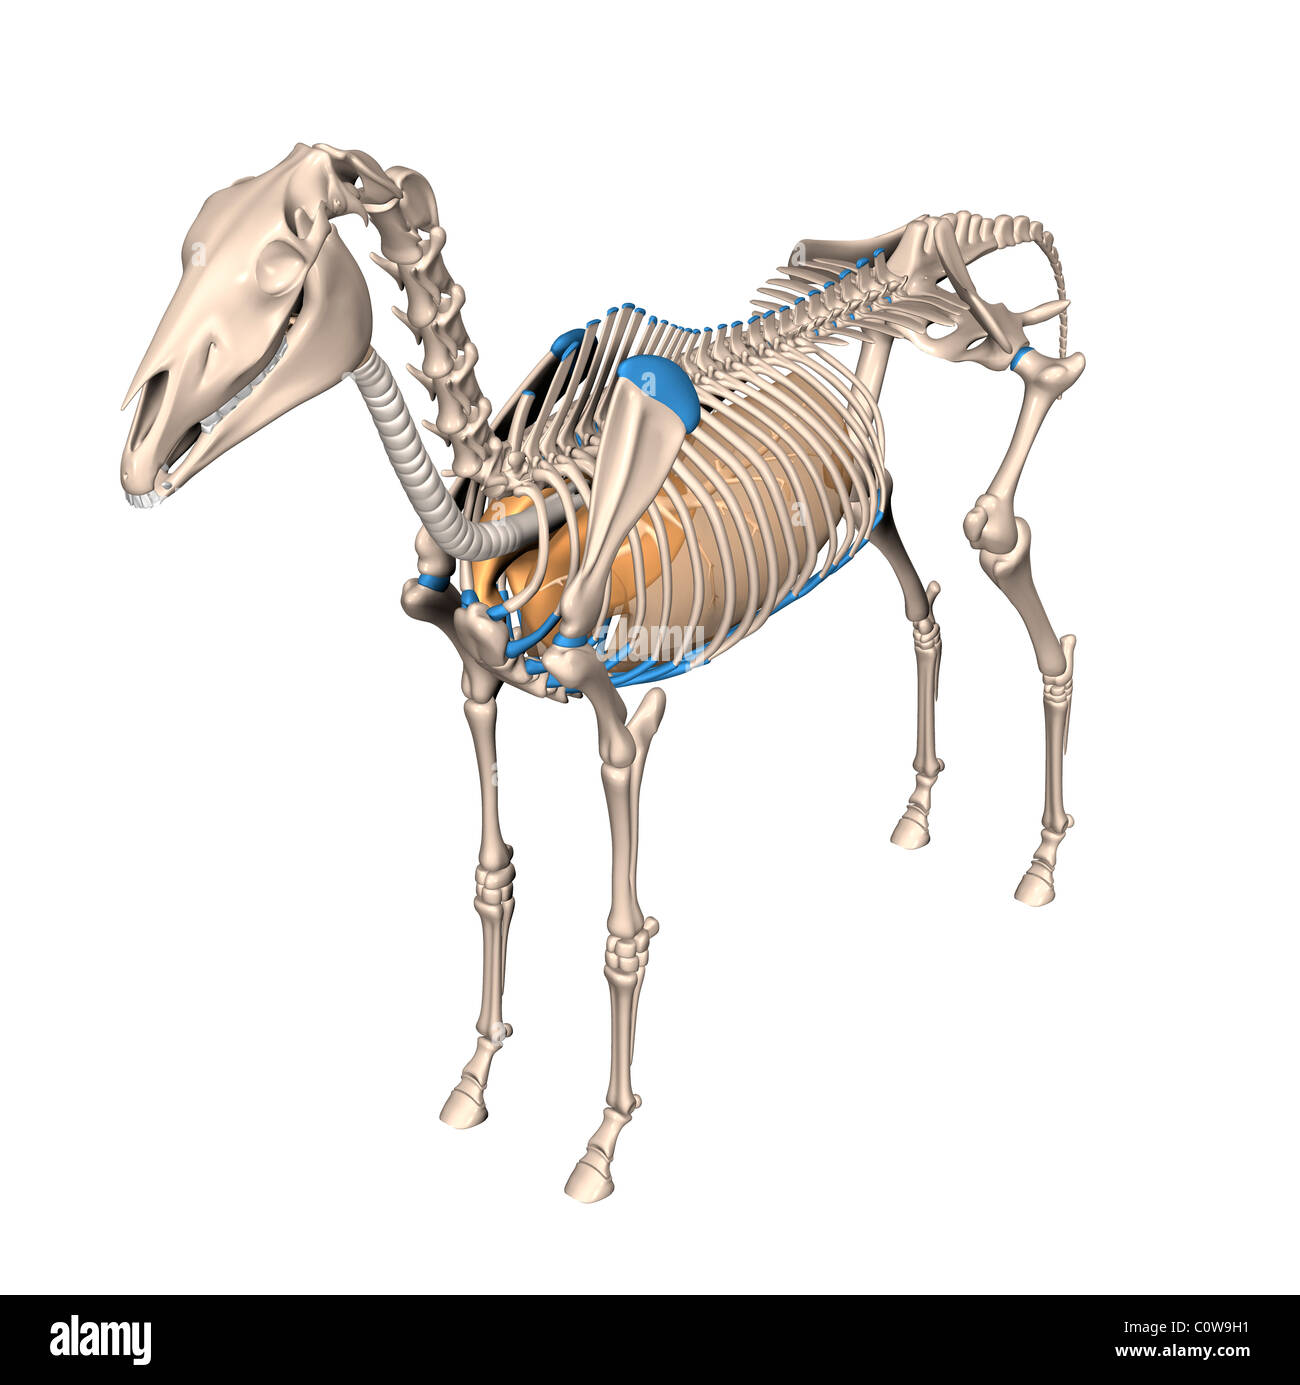 Pferd Anatomie Atemwege Lunge Skelett Stockfoto, Bild: 34977069 - Alamy